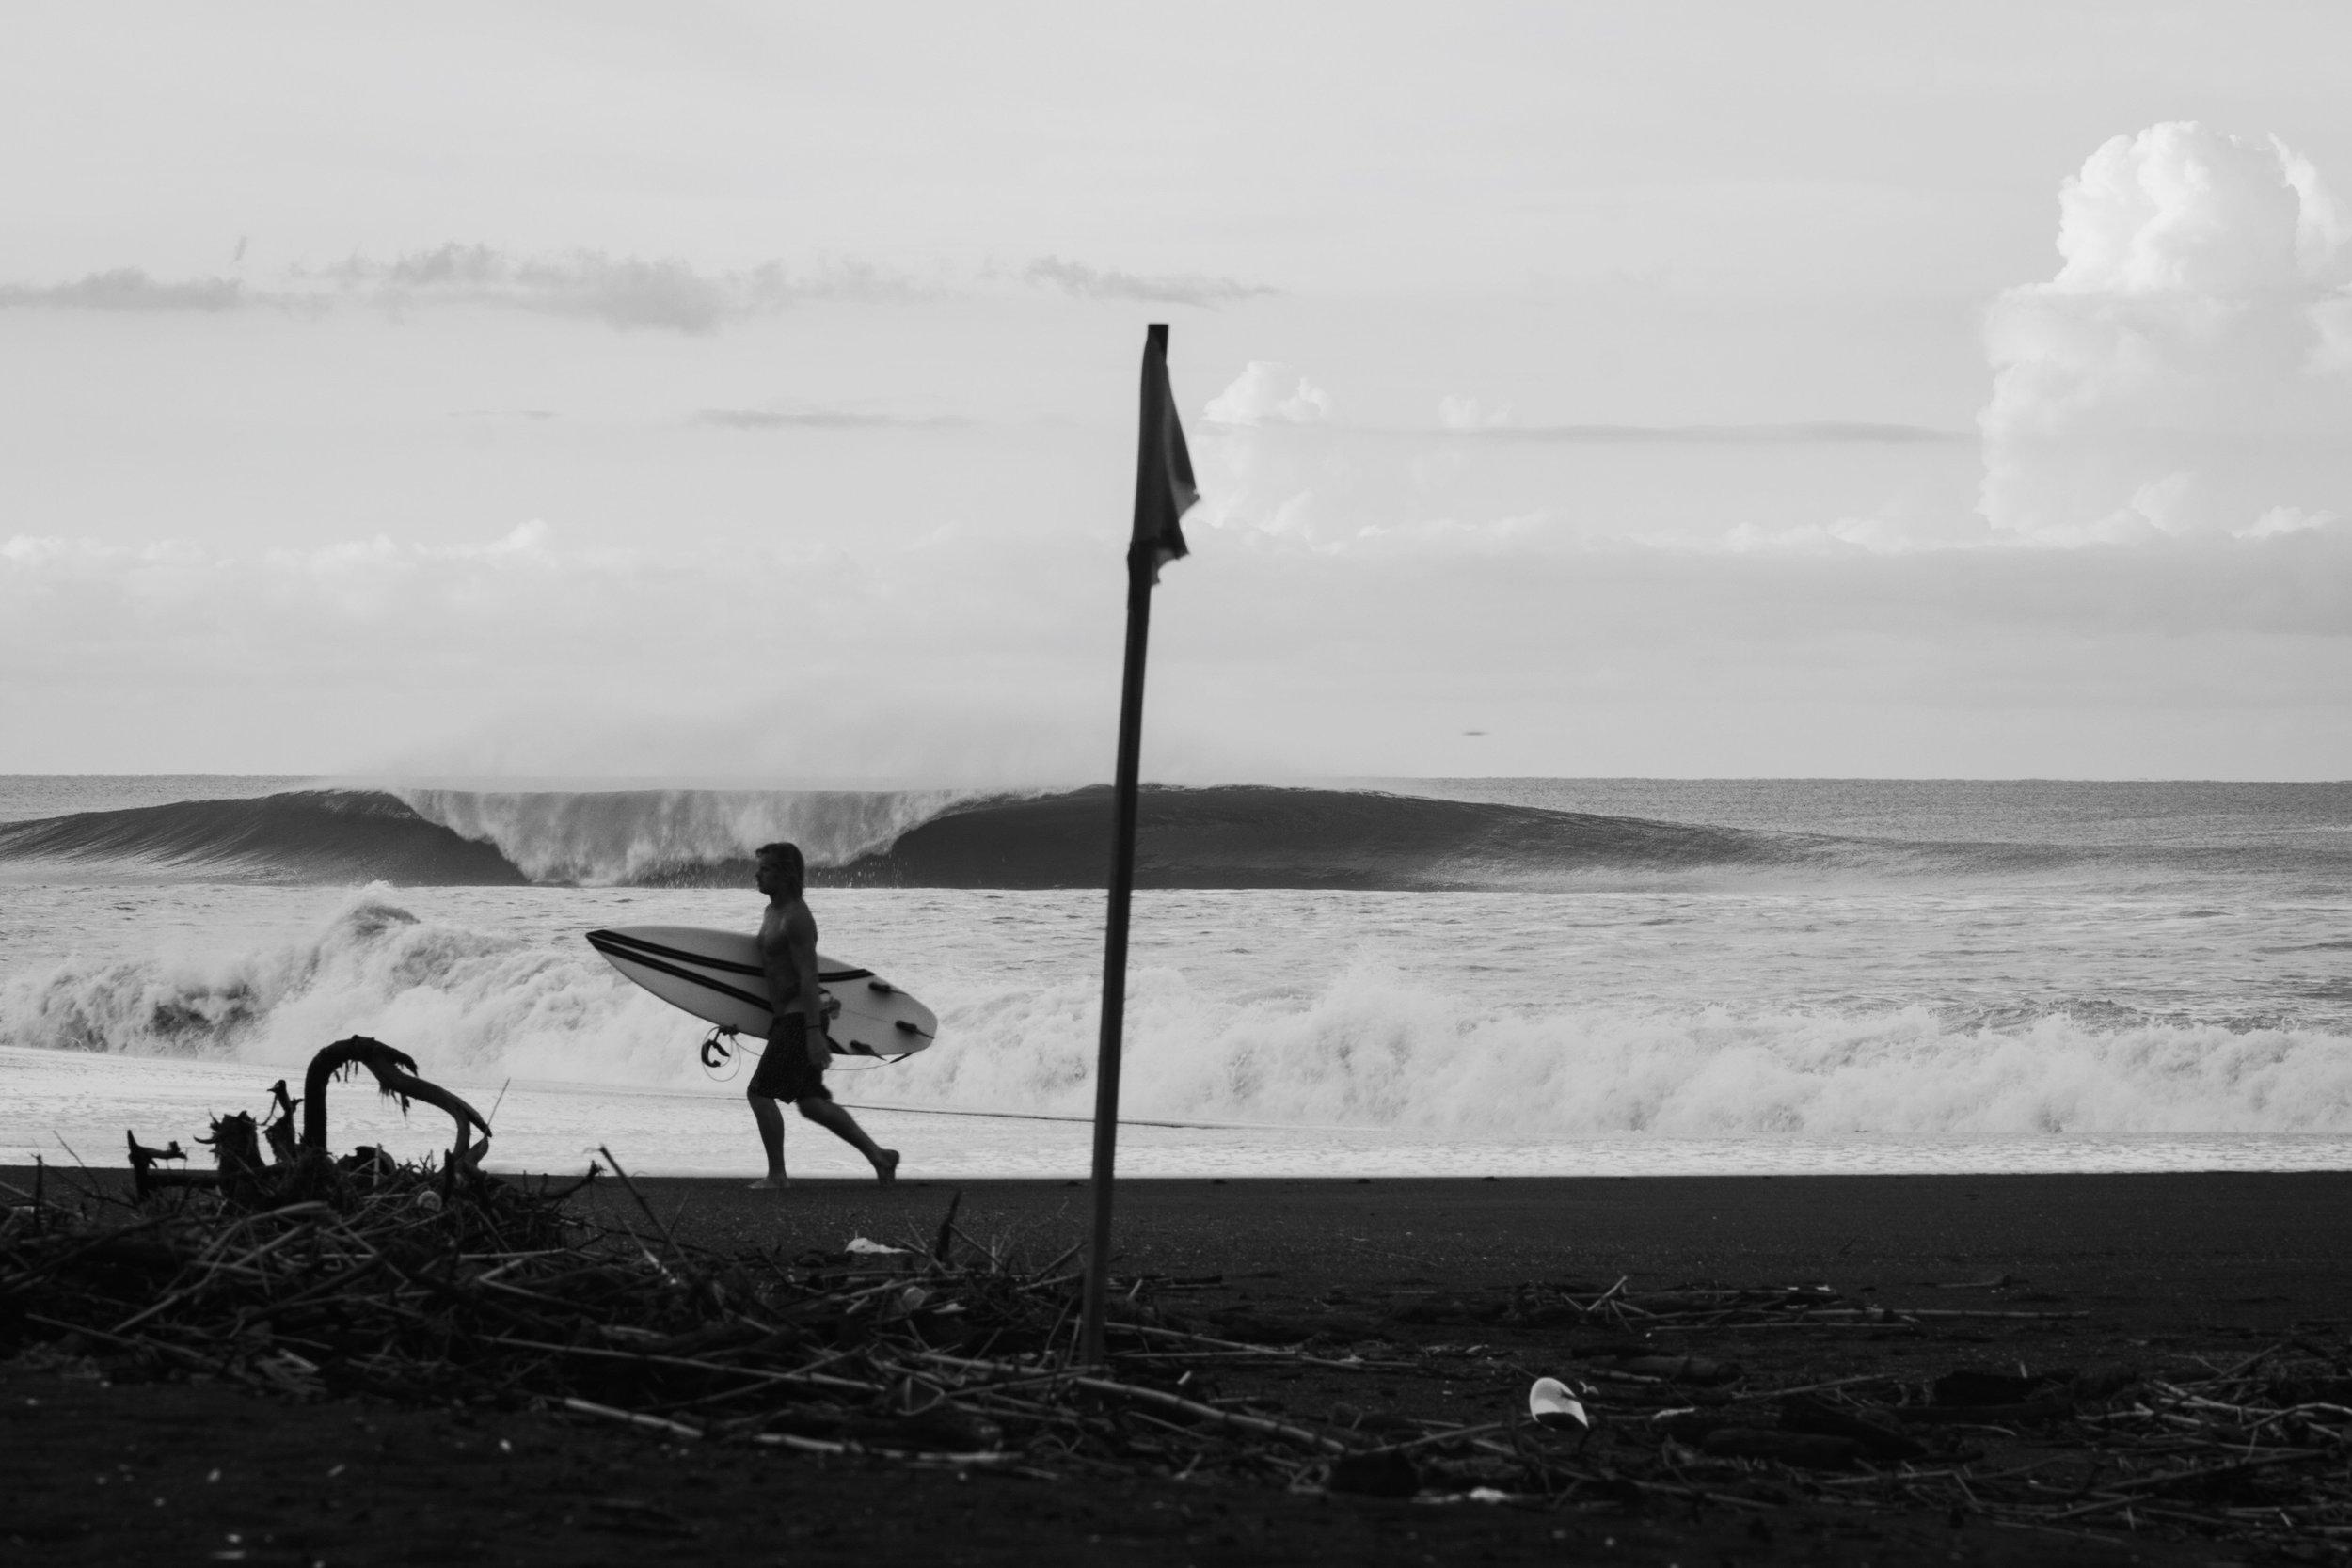 Tristan-Guibald-Surf-México-Sayulita-Pascuales-Zihuatanejo-Fotografía-Heiko-Bothe-4.JPG